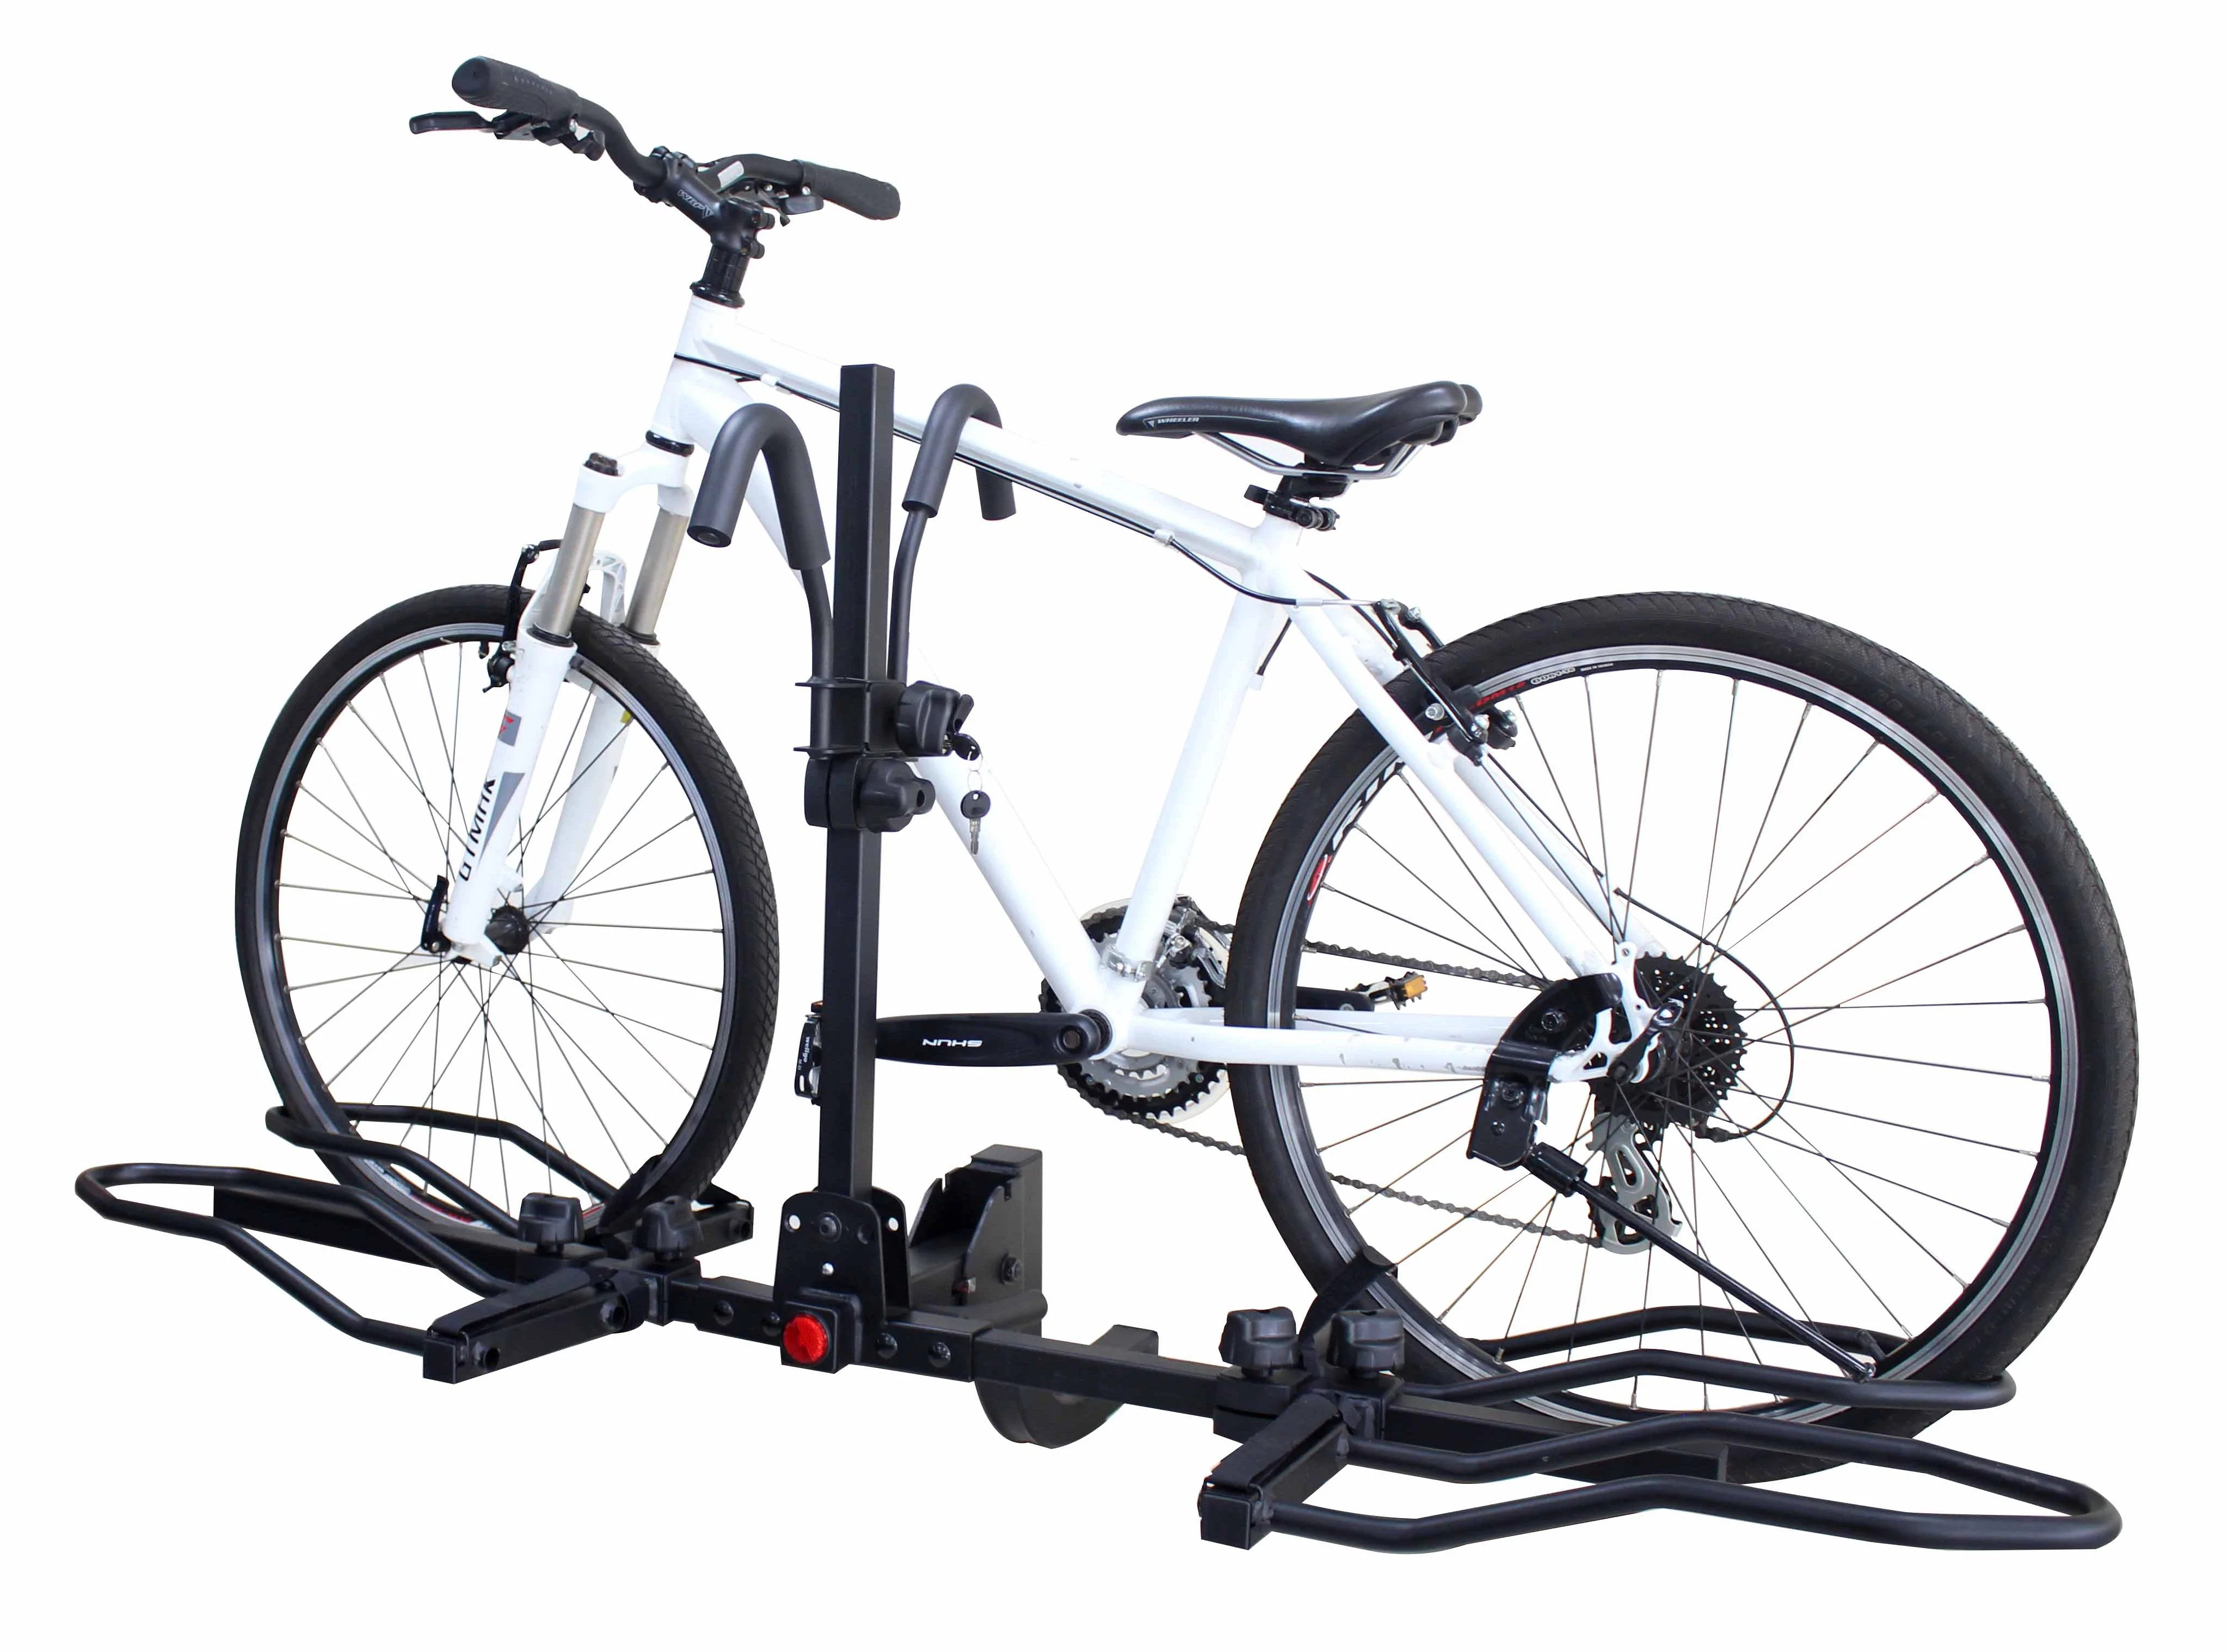 hitch bike racks for electric bikes and